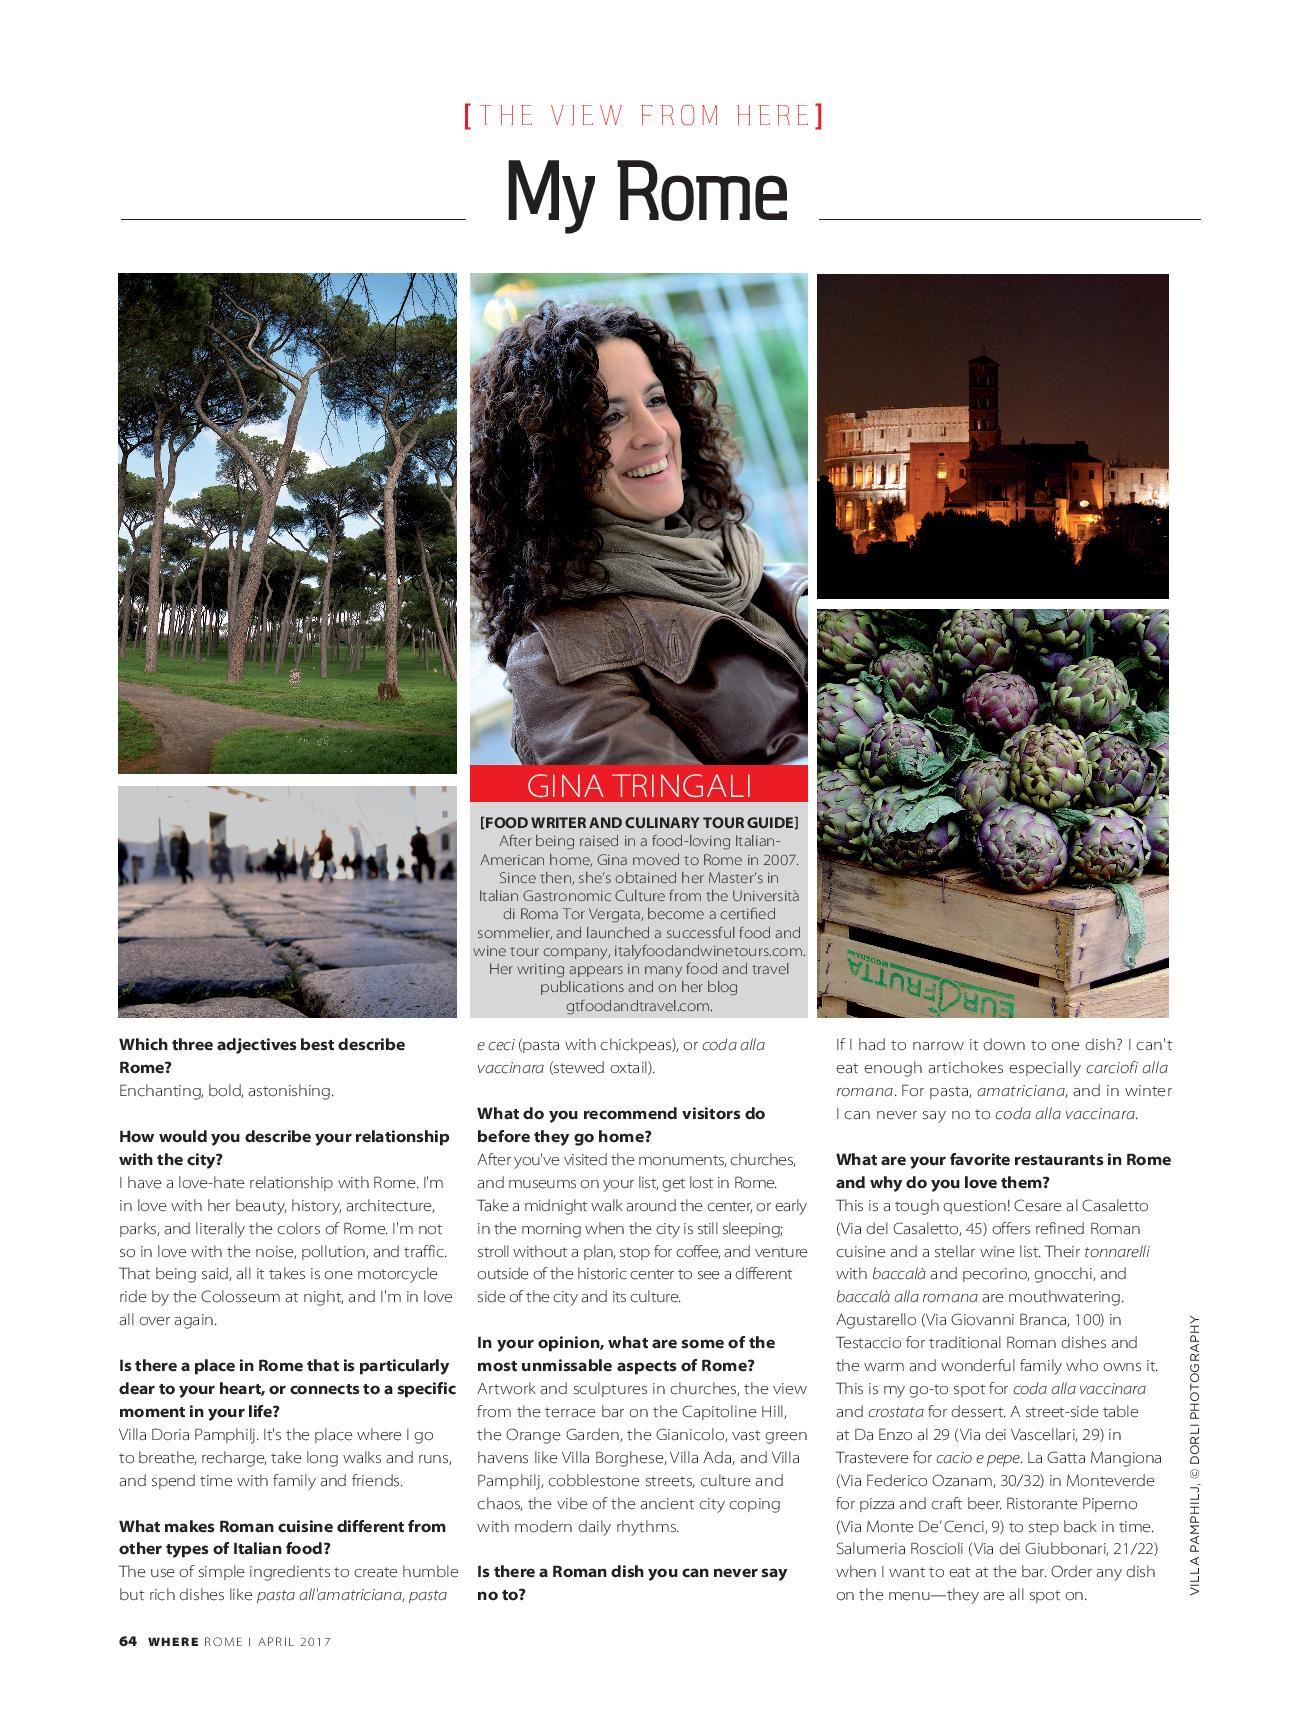 My Rome, Gina Tringali, Where Rome, April 2017-page-001.jpg